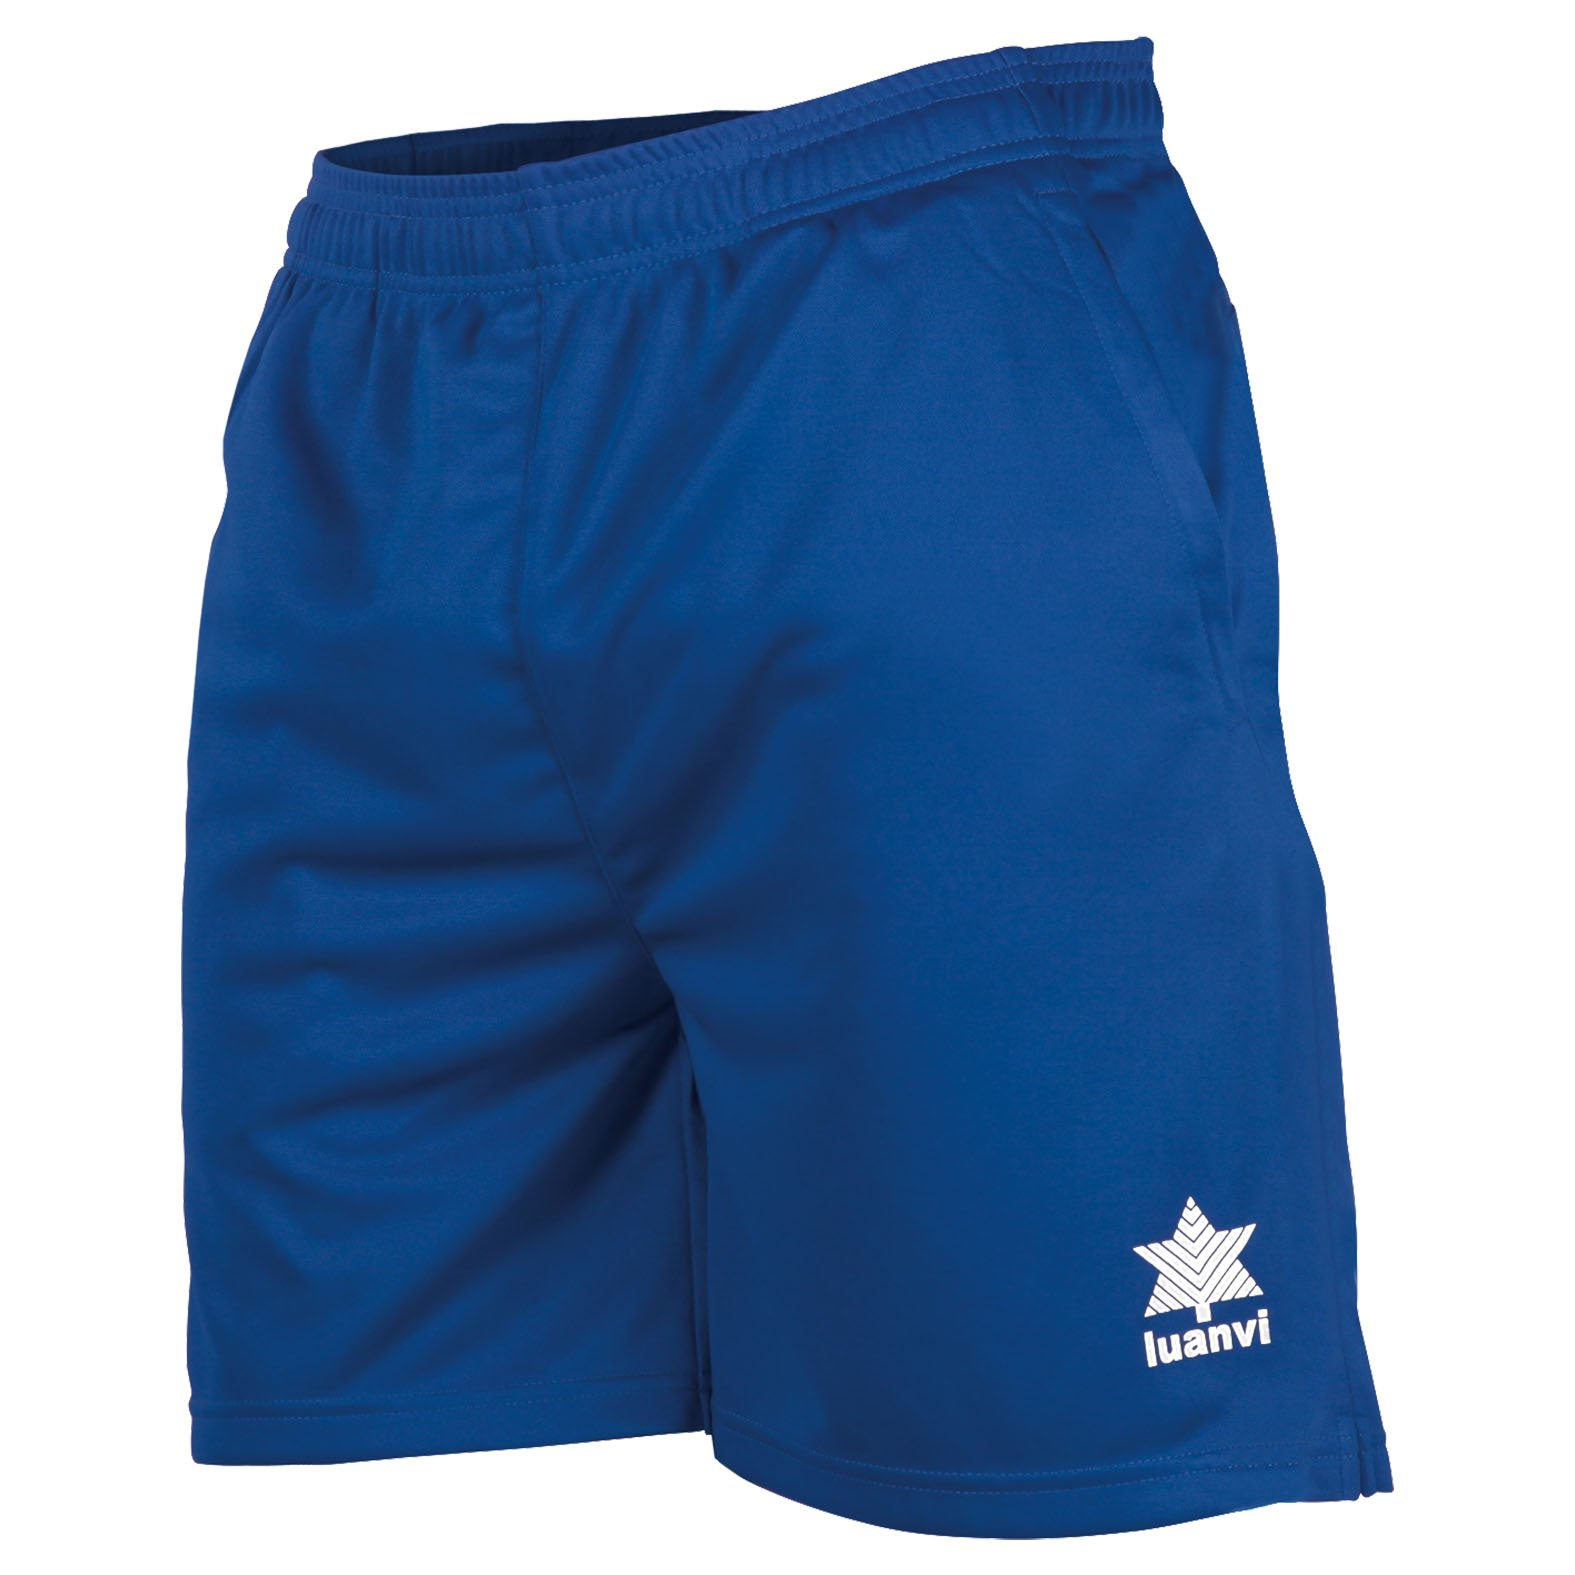 Luanvi Walk Bermudas de Tenis, Hombre, Azul Royal, L product image